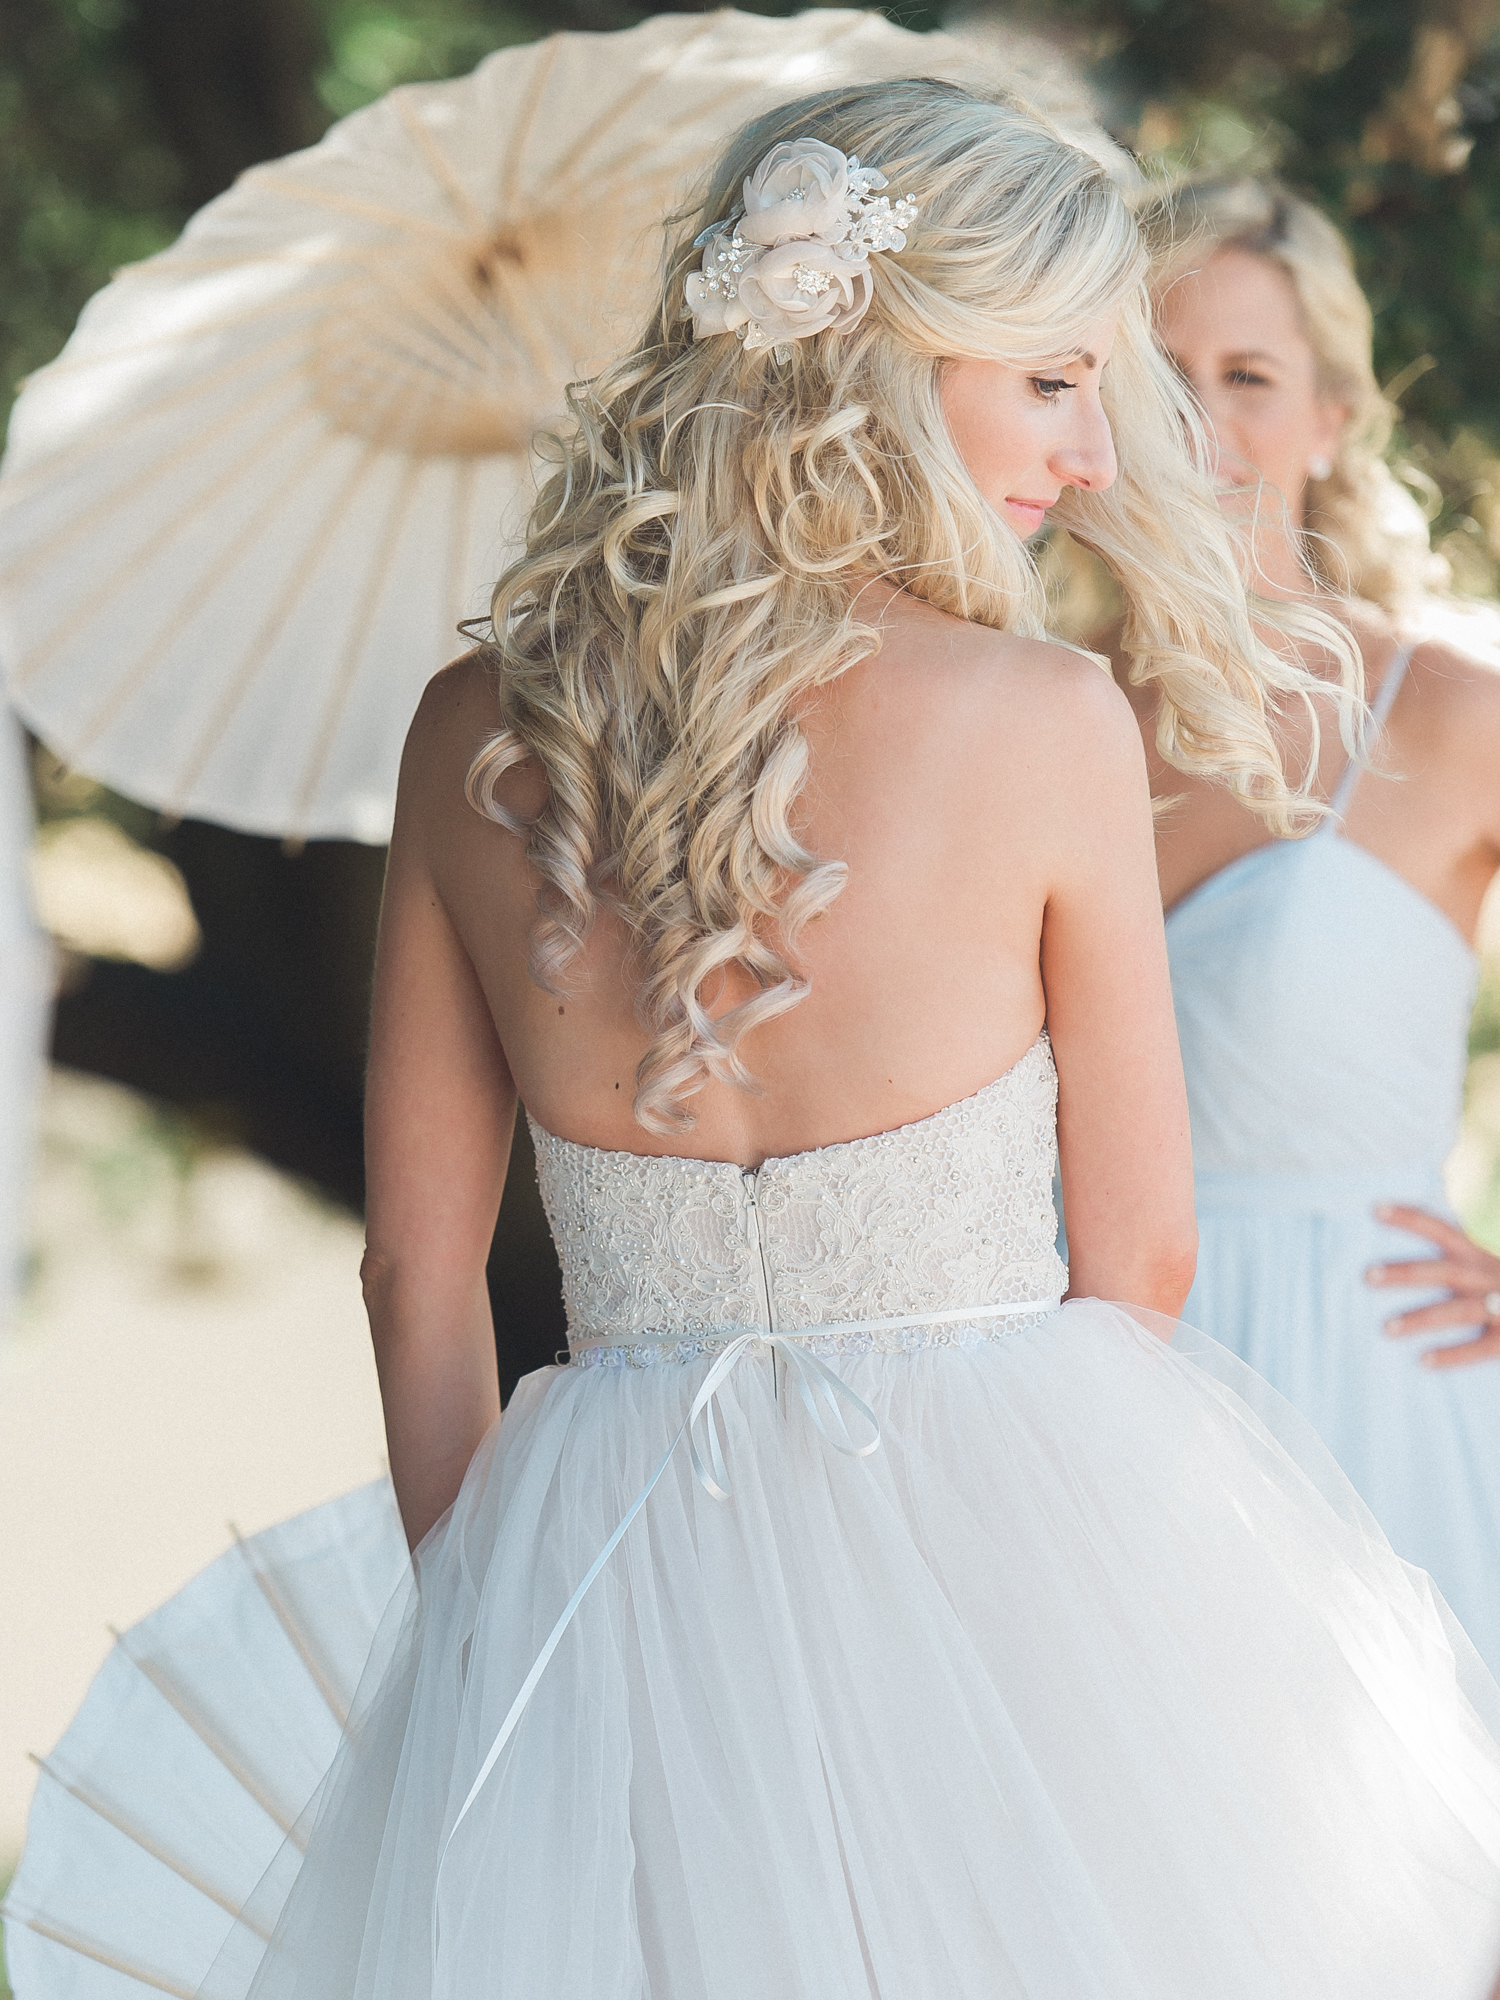 Aimee+Logan_wedding_spp-66.jpg